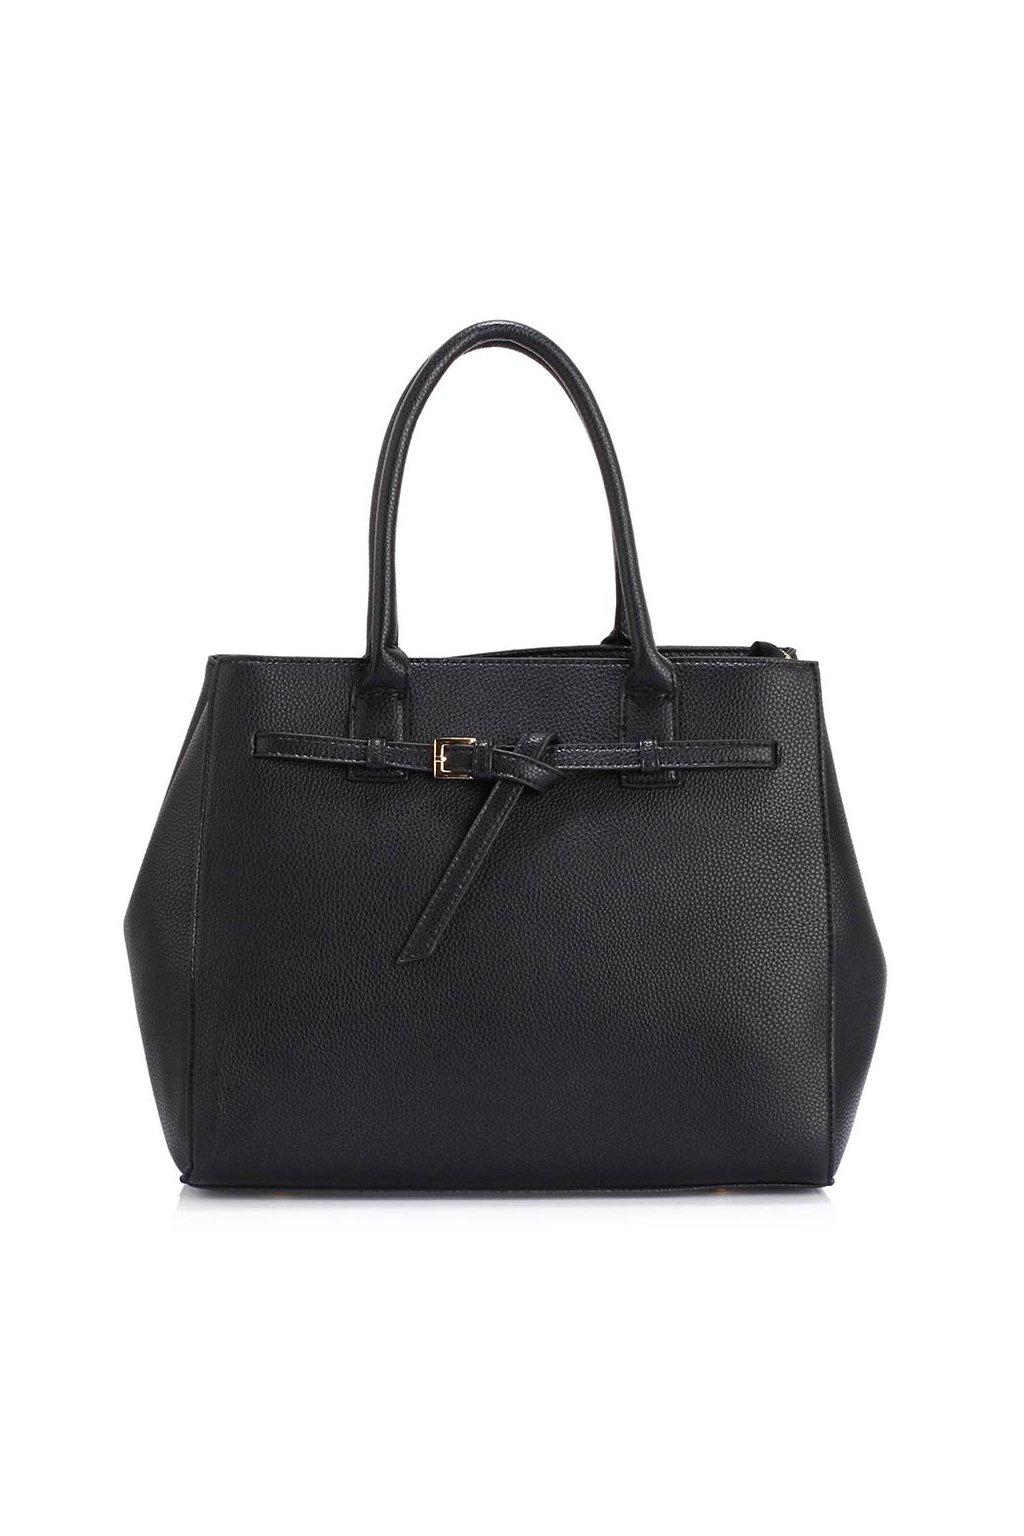 Čierna kabelka do ruky Adriana AG00447